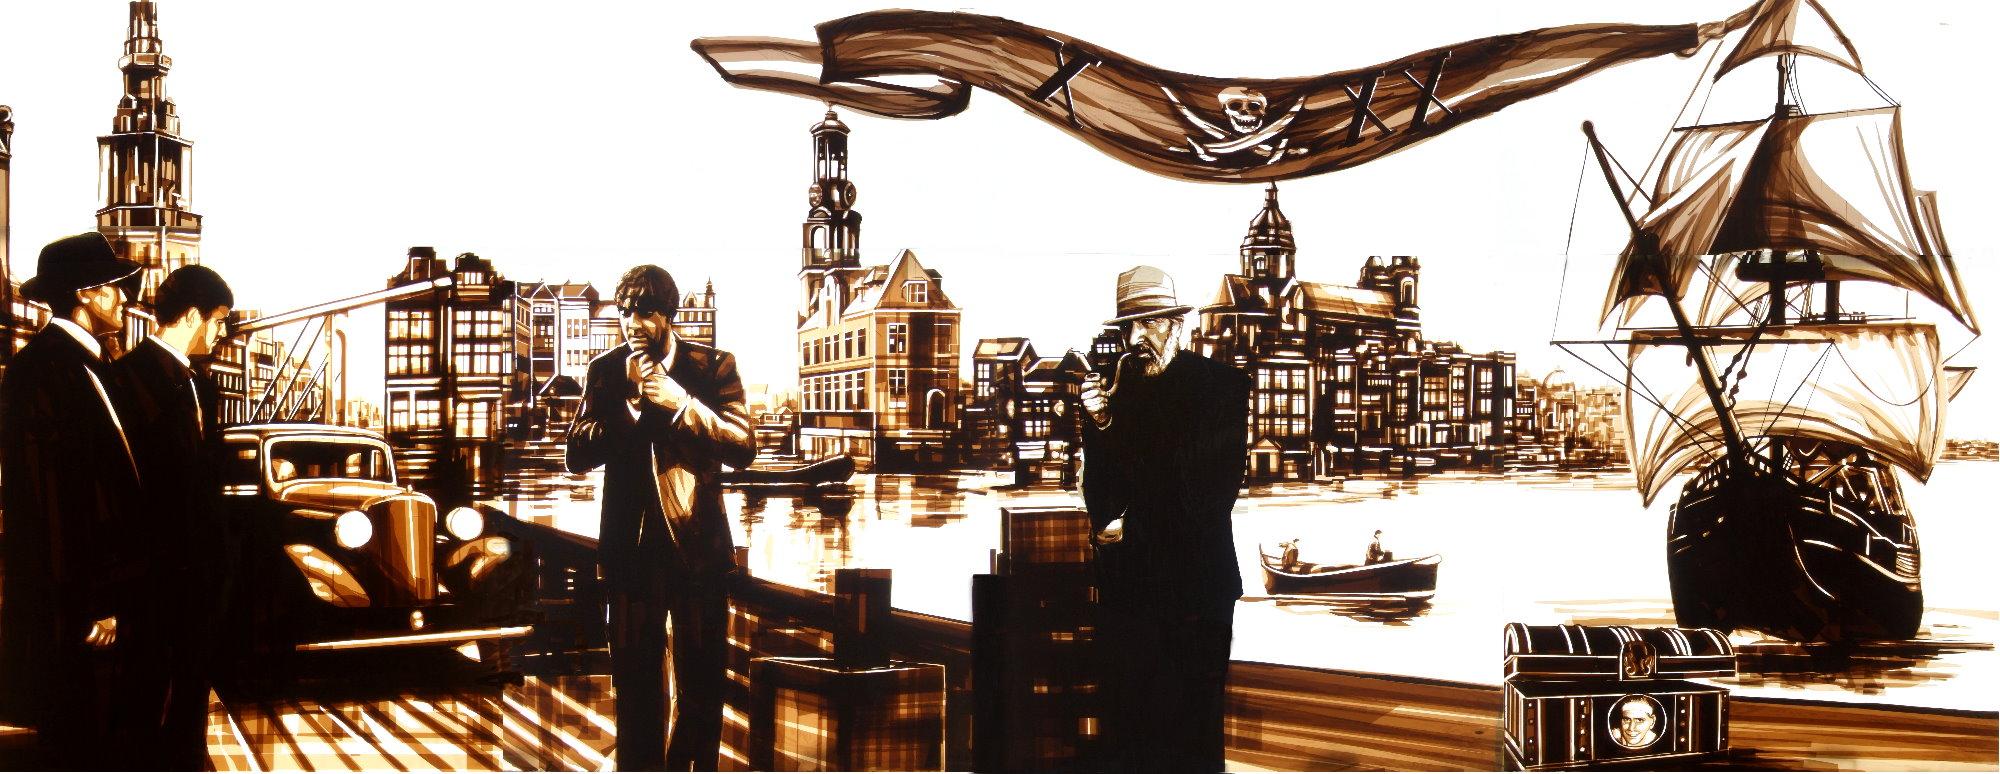 Max zorn, de dampkring, Amsterdam tape art